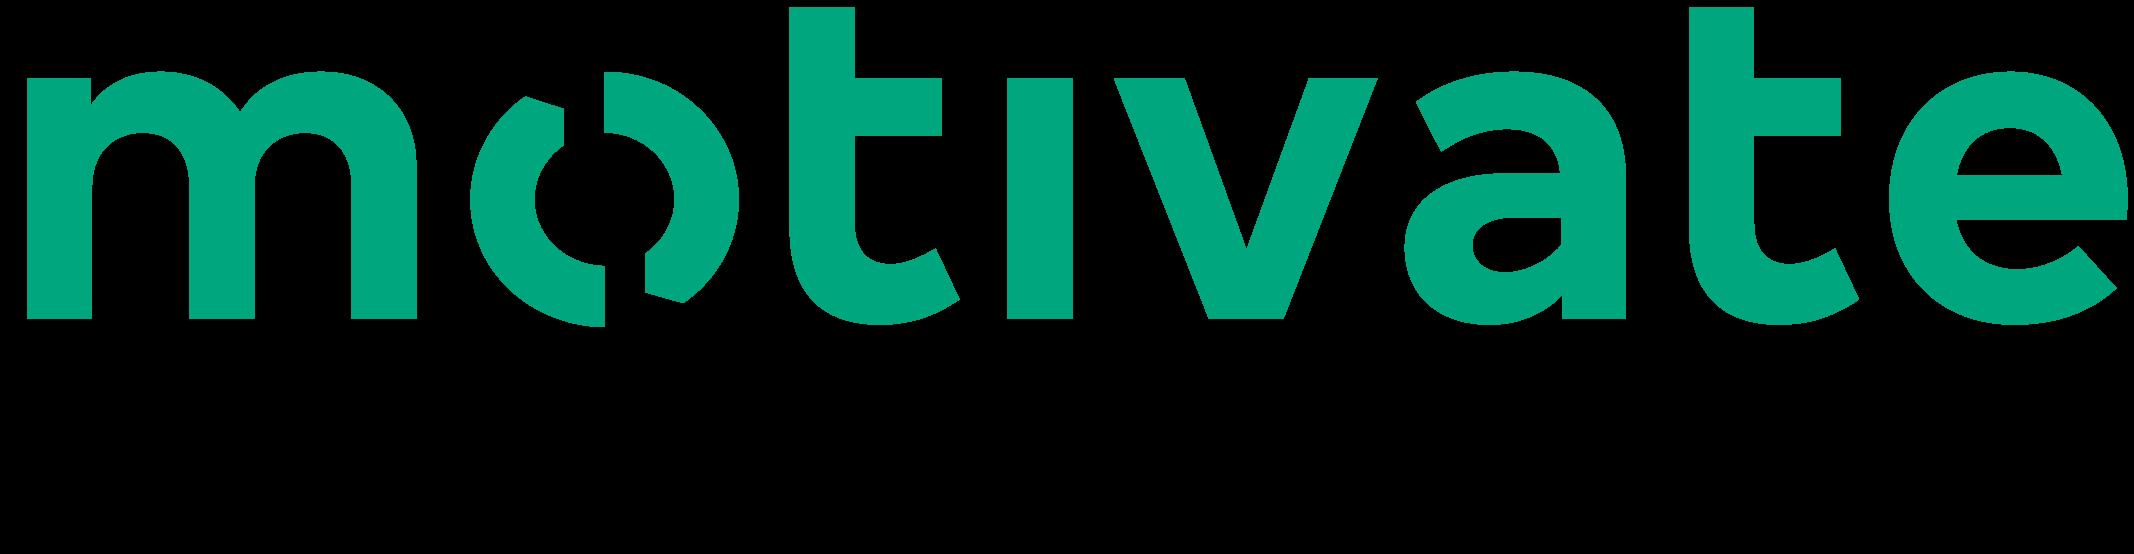 Motivate Logos-03